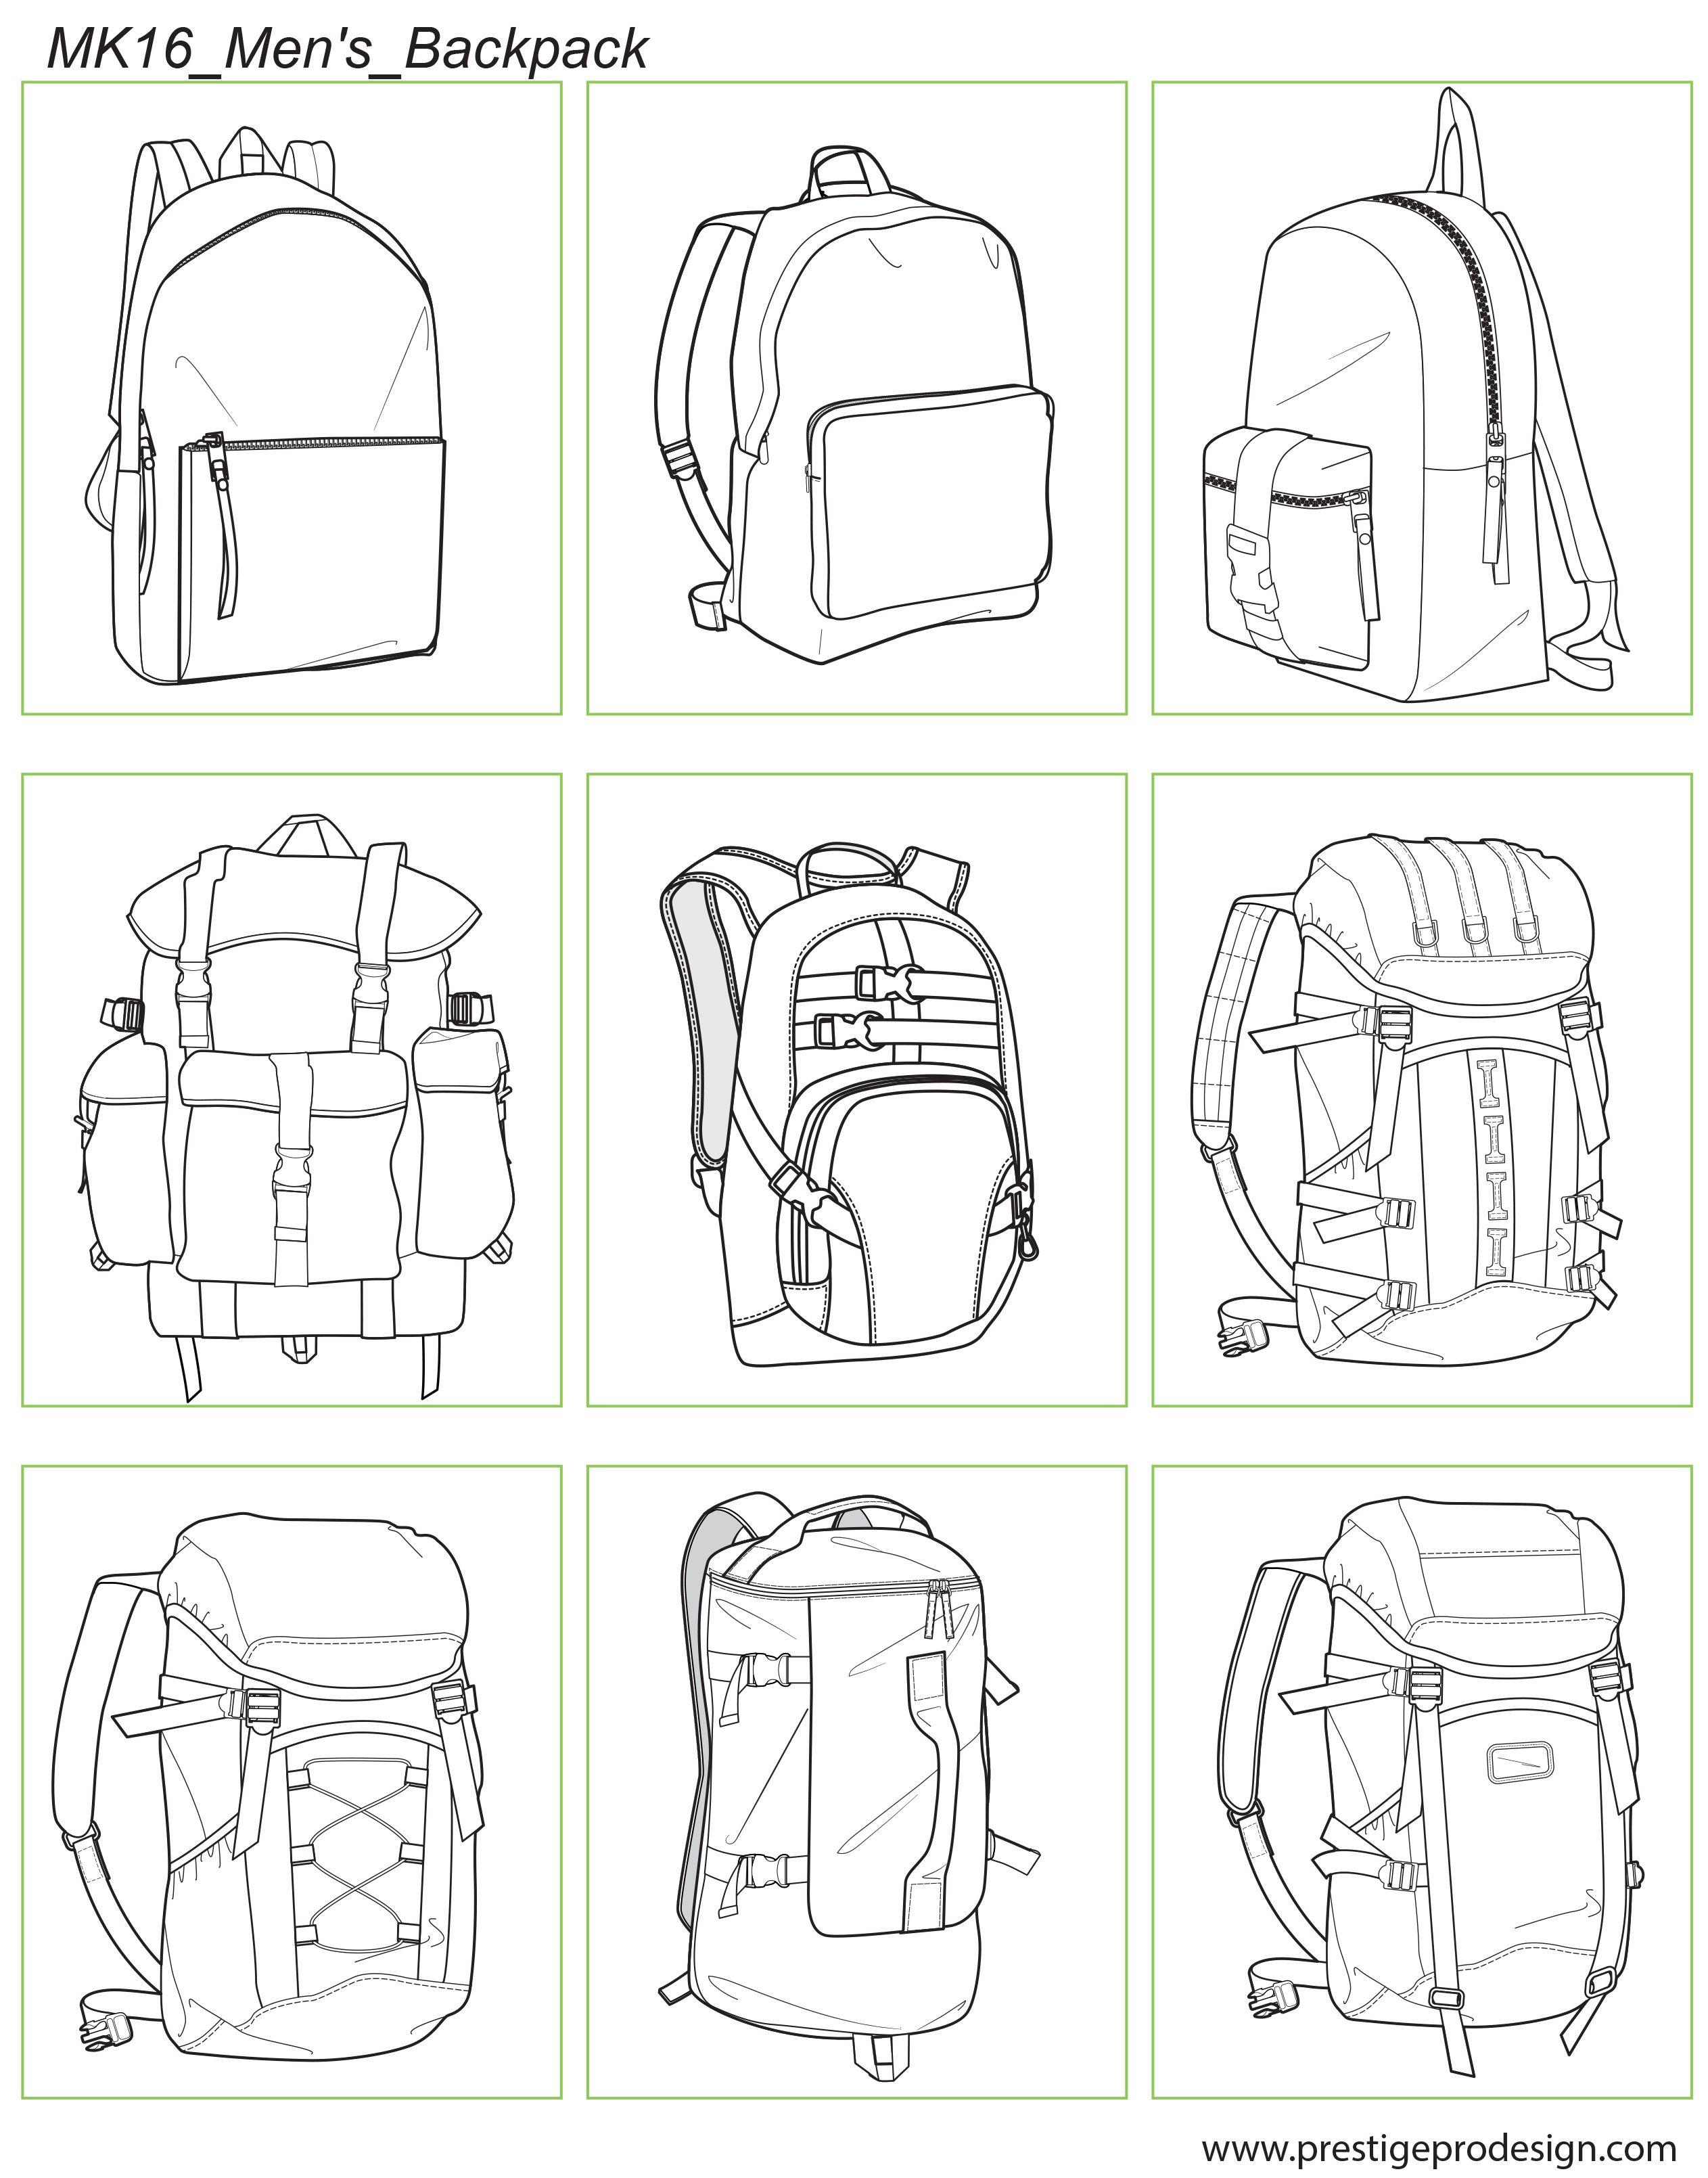 MK16_Men\'s_Backpack | Men\'s backpack | Pinterest | Zeichnen, Ideen ...